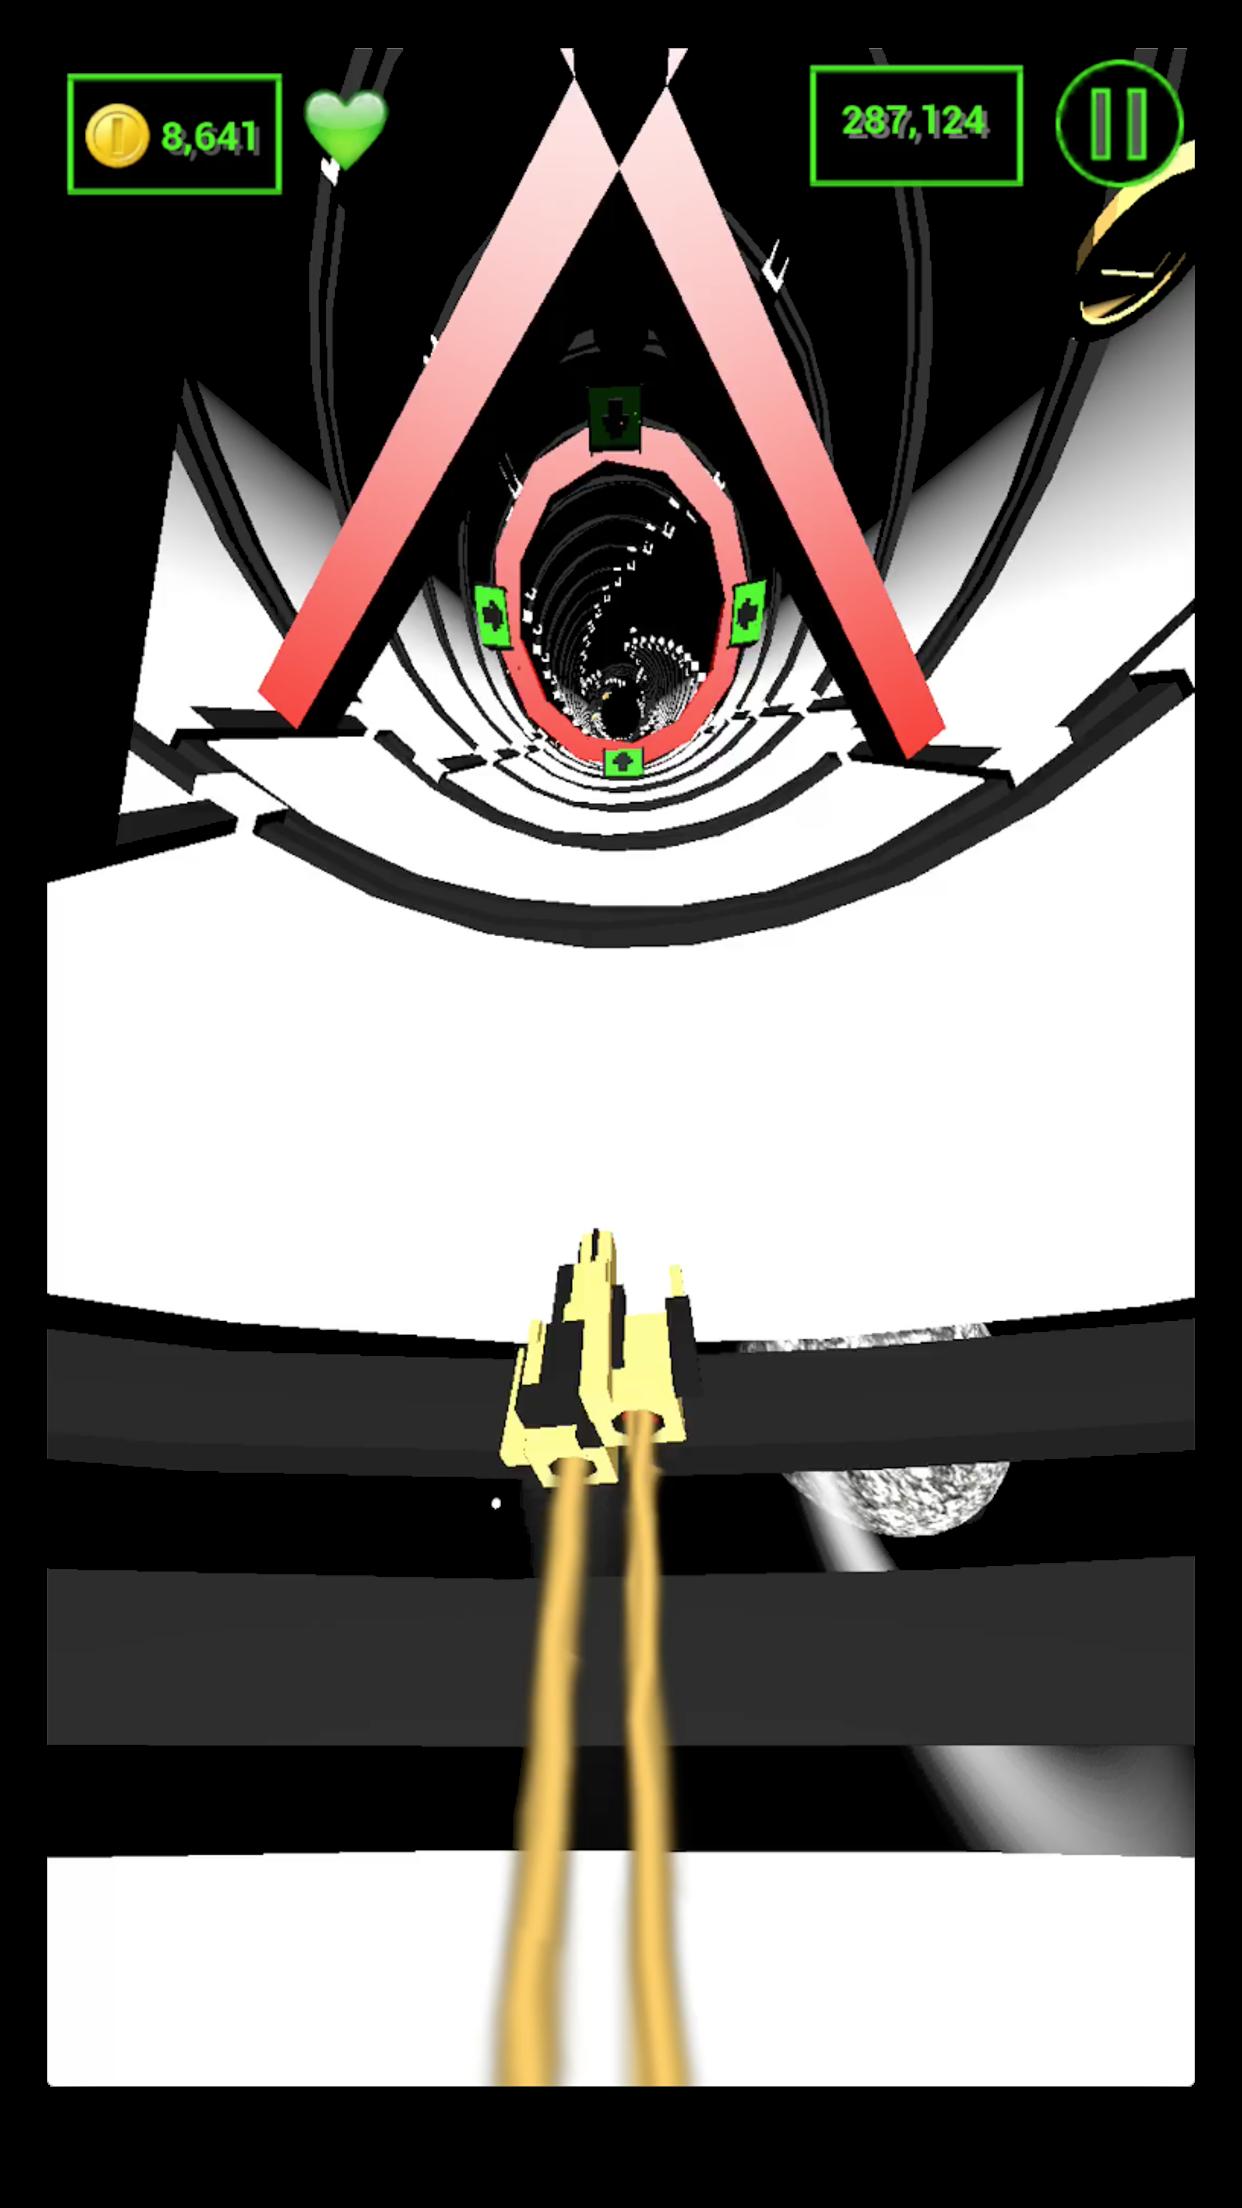 Sphone 5